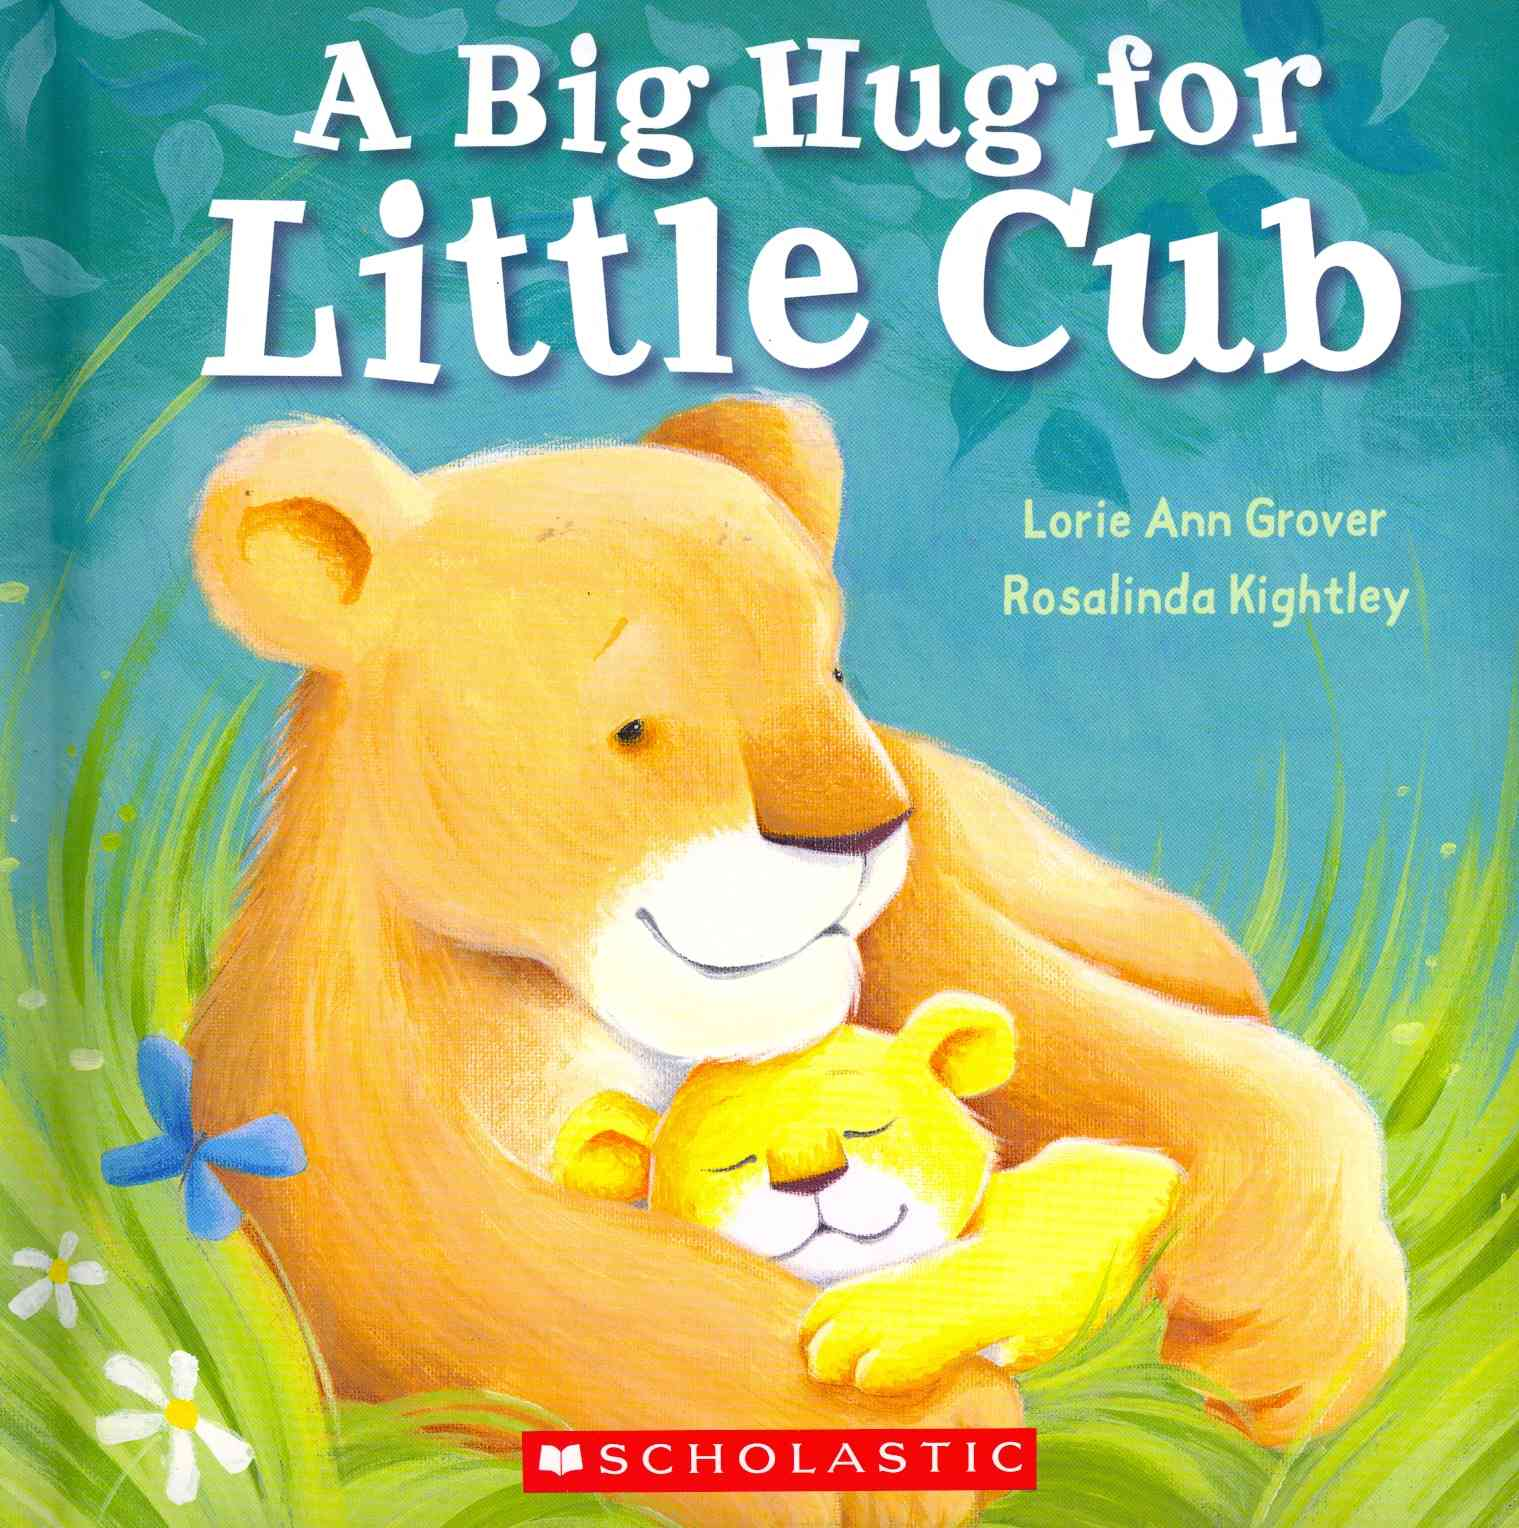 Big Hug for Little Cub By Grover, Lorie Ann/ Kightley, Rosalinda (ILT)